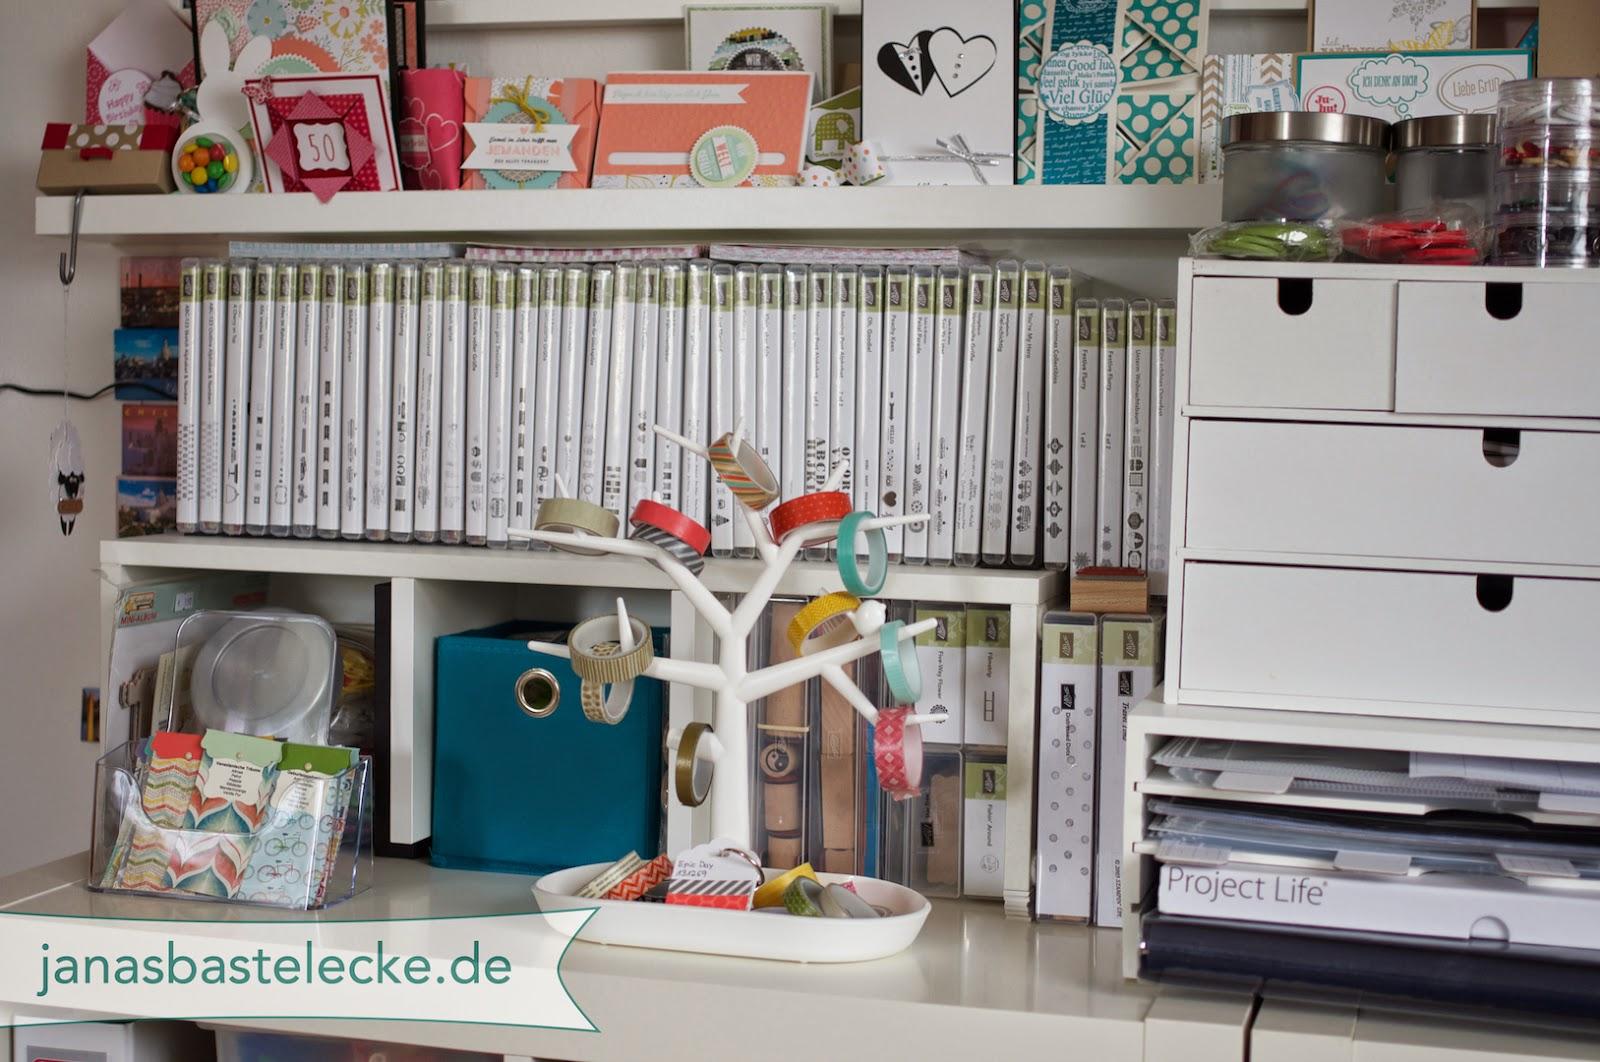 janasbastelecke aufbewahrung washi tape. Black Bedroom Furniture Sets. Home Design Ideas